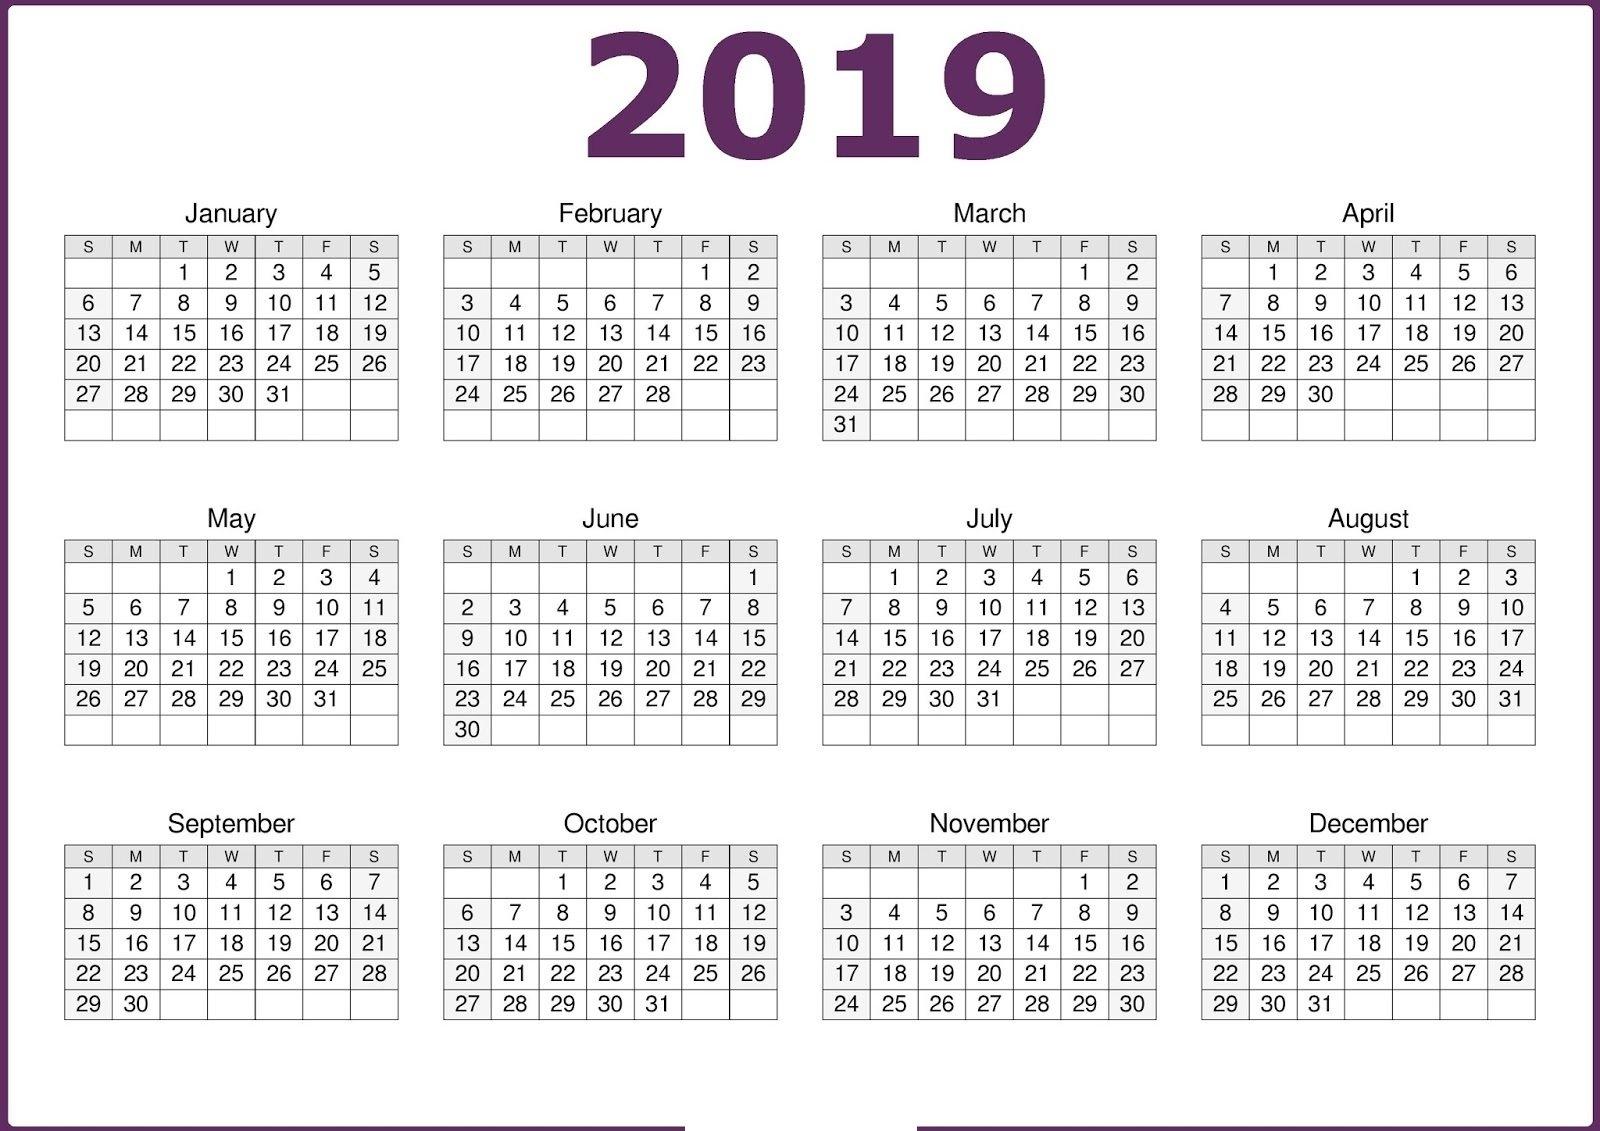 Get Free Blank Calendar Pages 2019 Templates   August 2018 Calendar 2019 Calendar Qld Printable